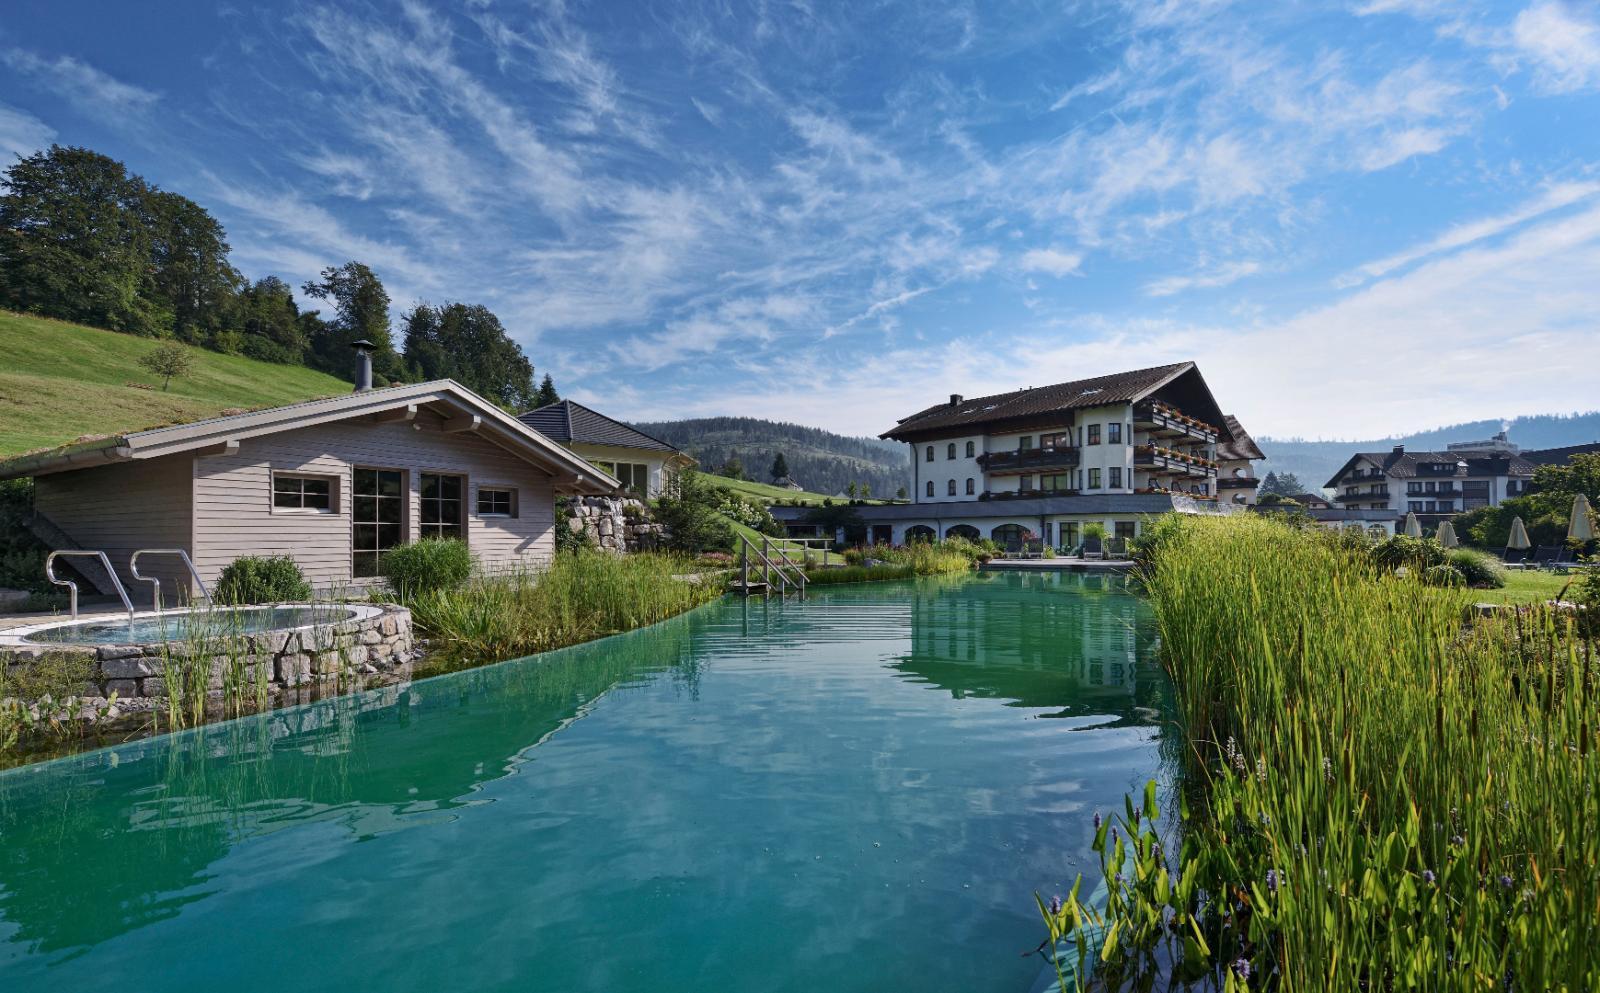 Hotel Engel Obertal 187 Baiersbronn 187 Hotelbewertung